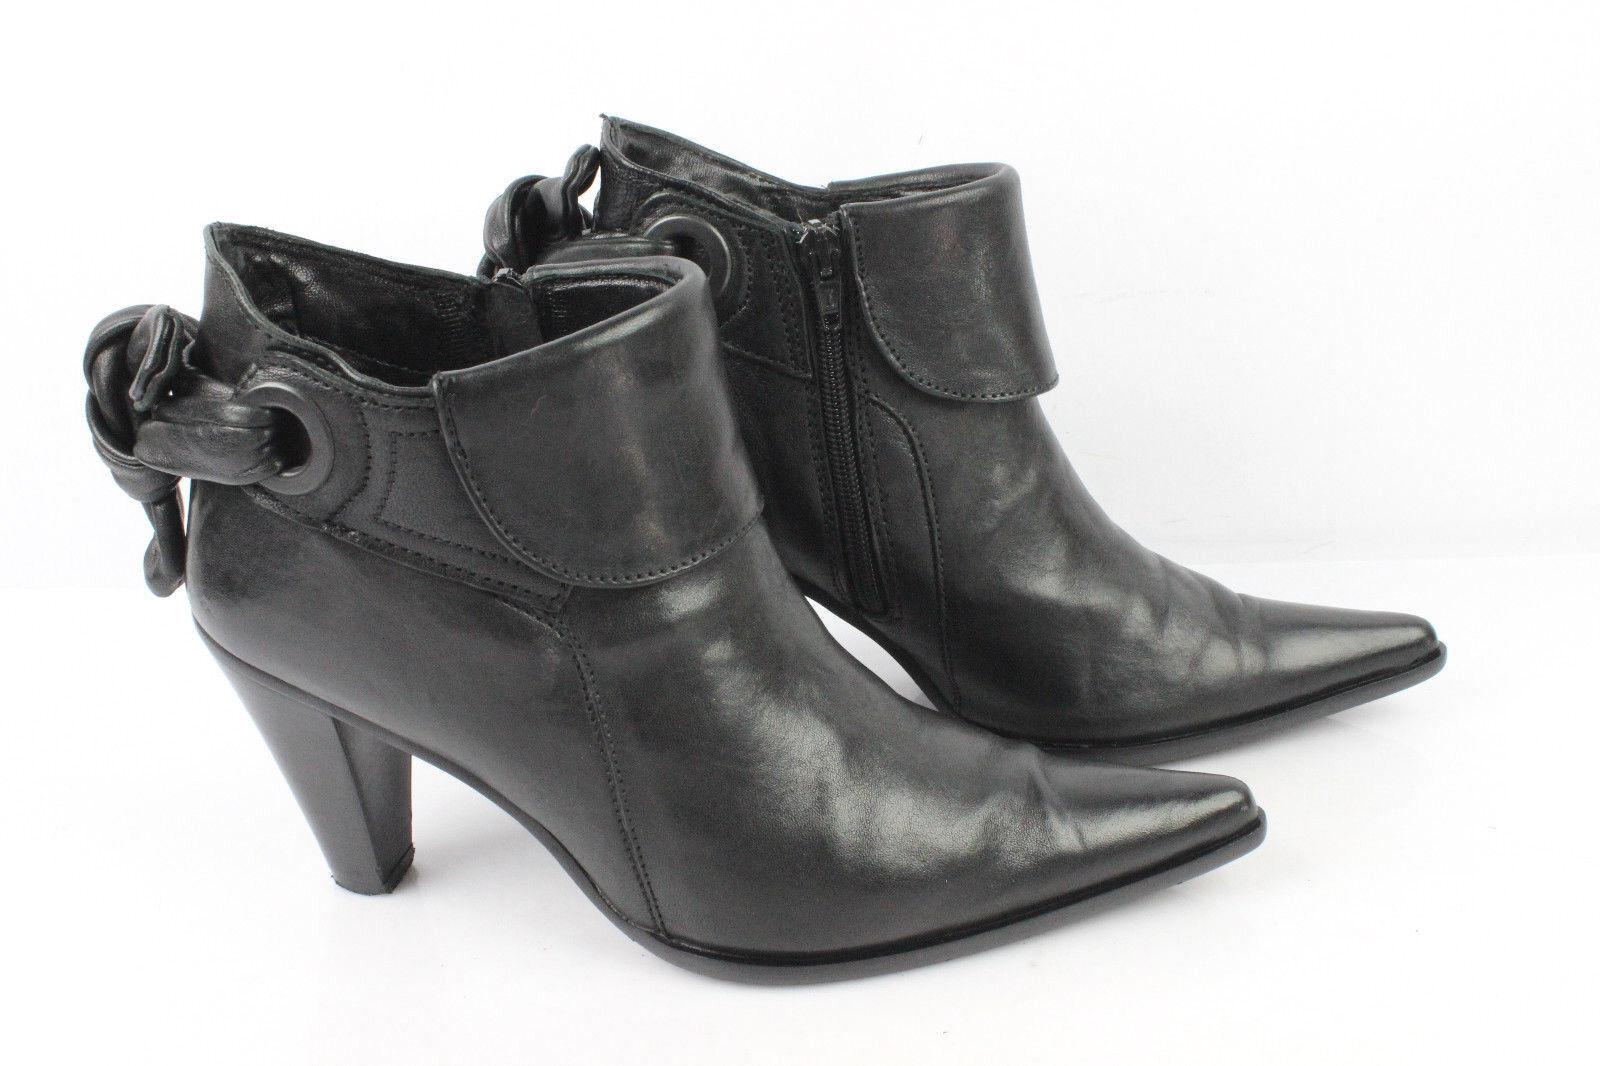 Bottines Boots DONN ADRIANA Cuir black T 38 TRES BON ETAT